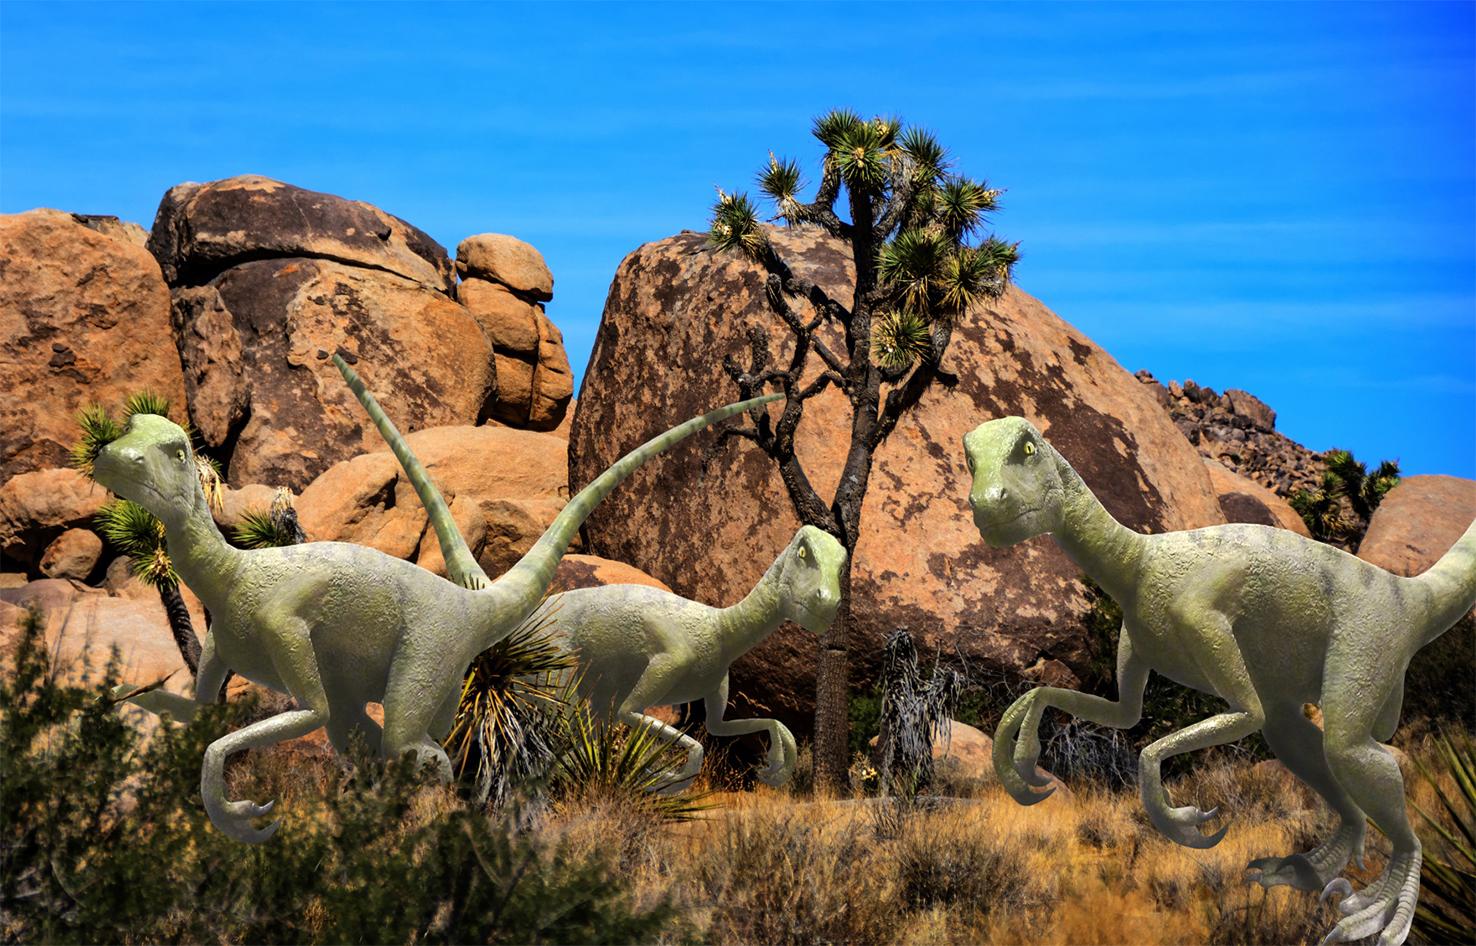 Picture of three velociraptors